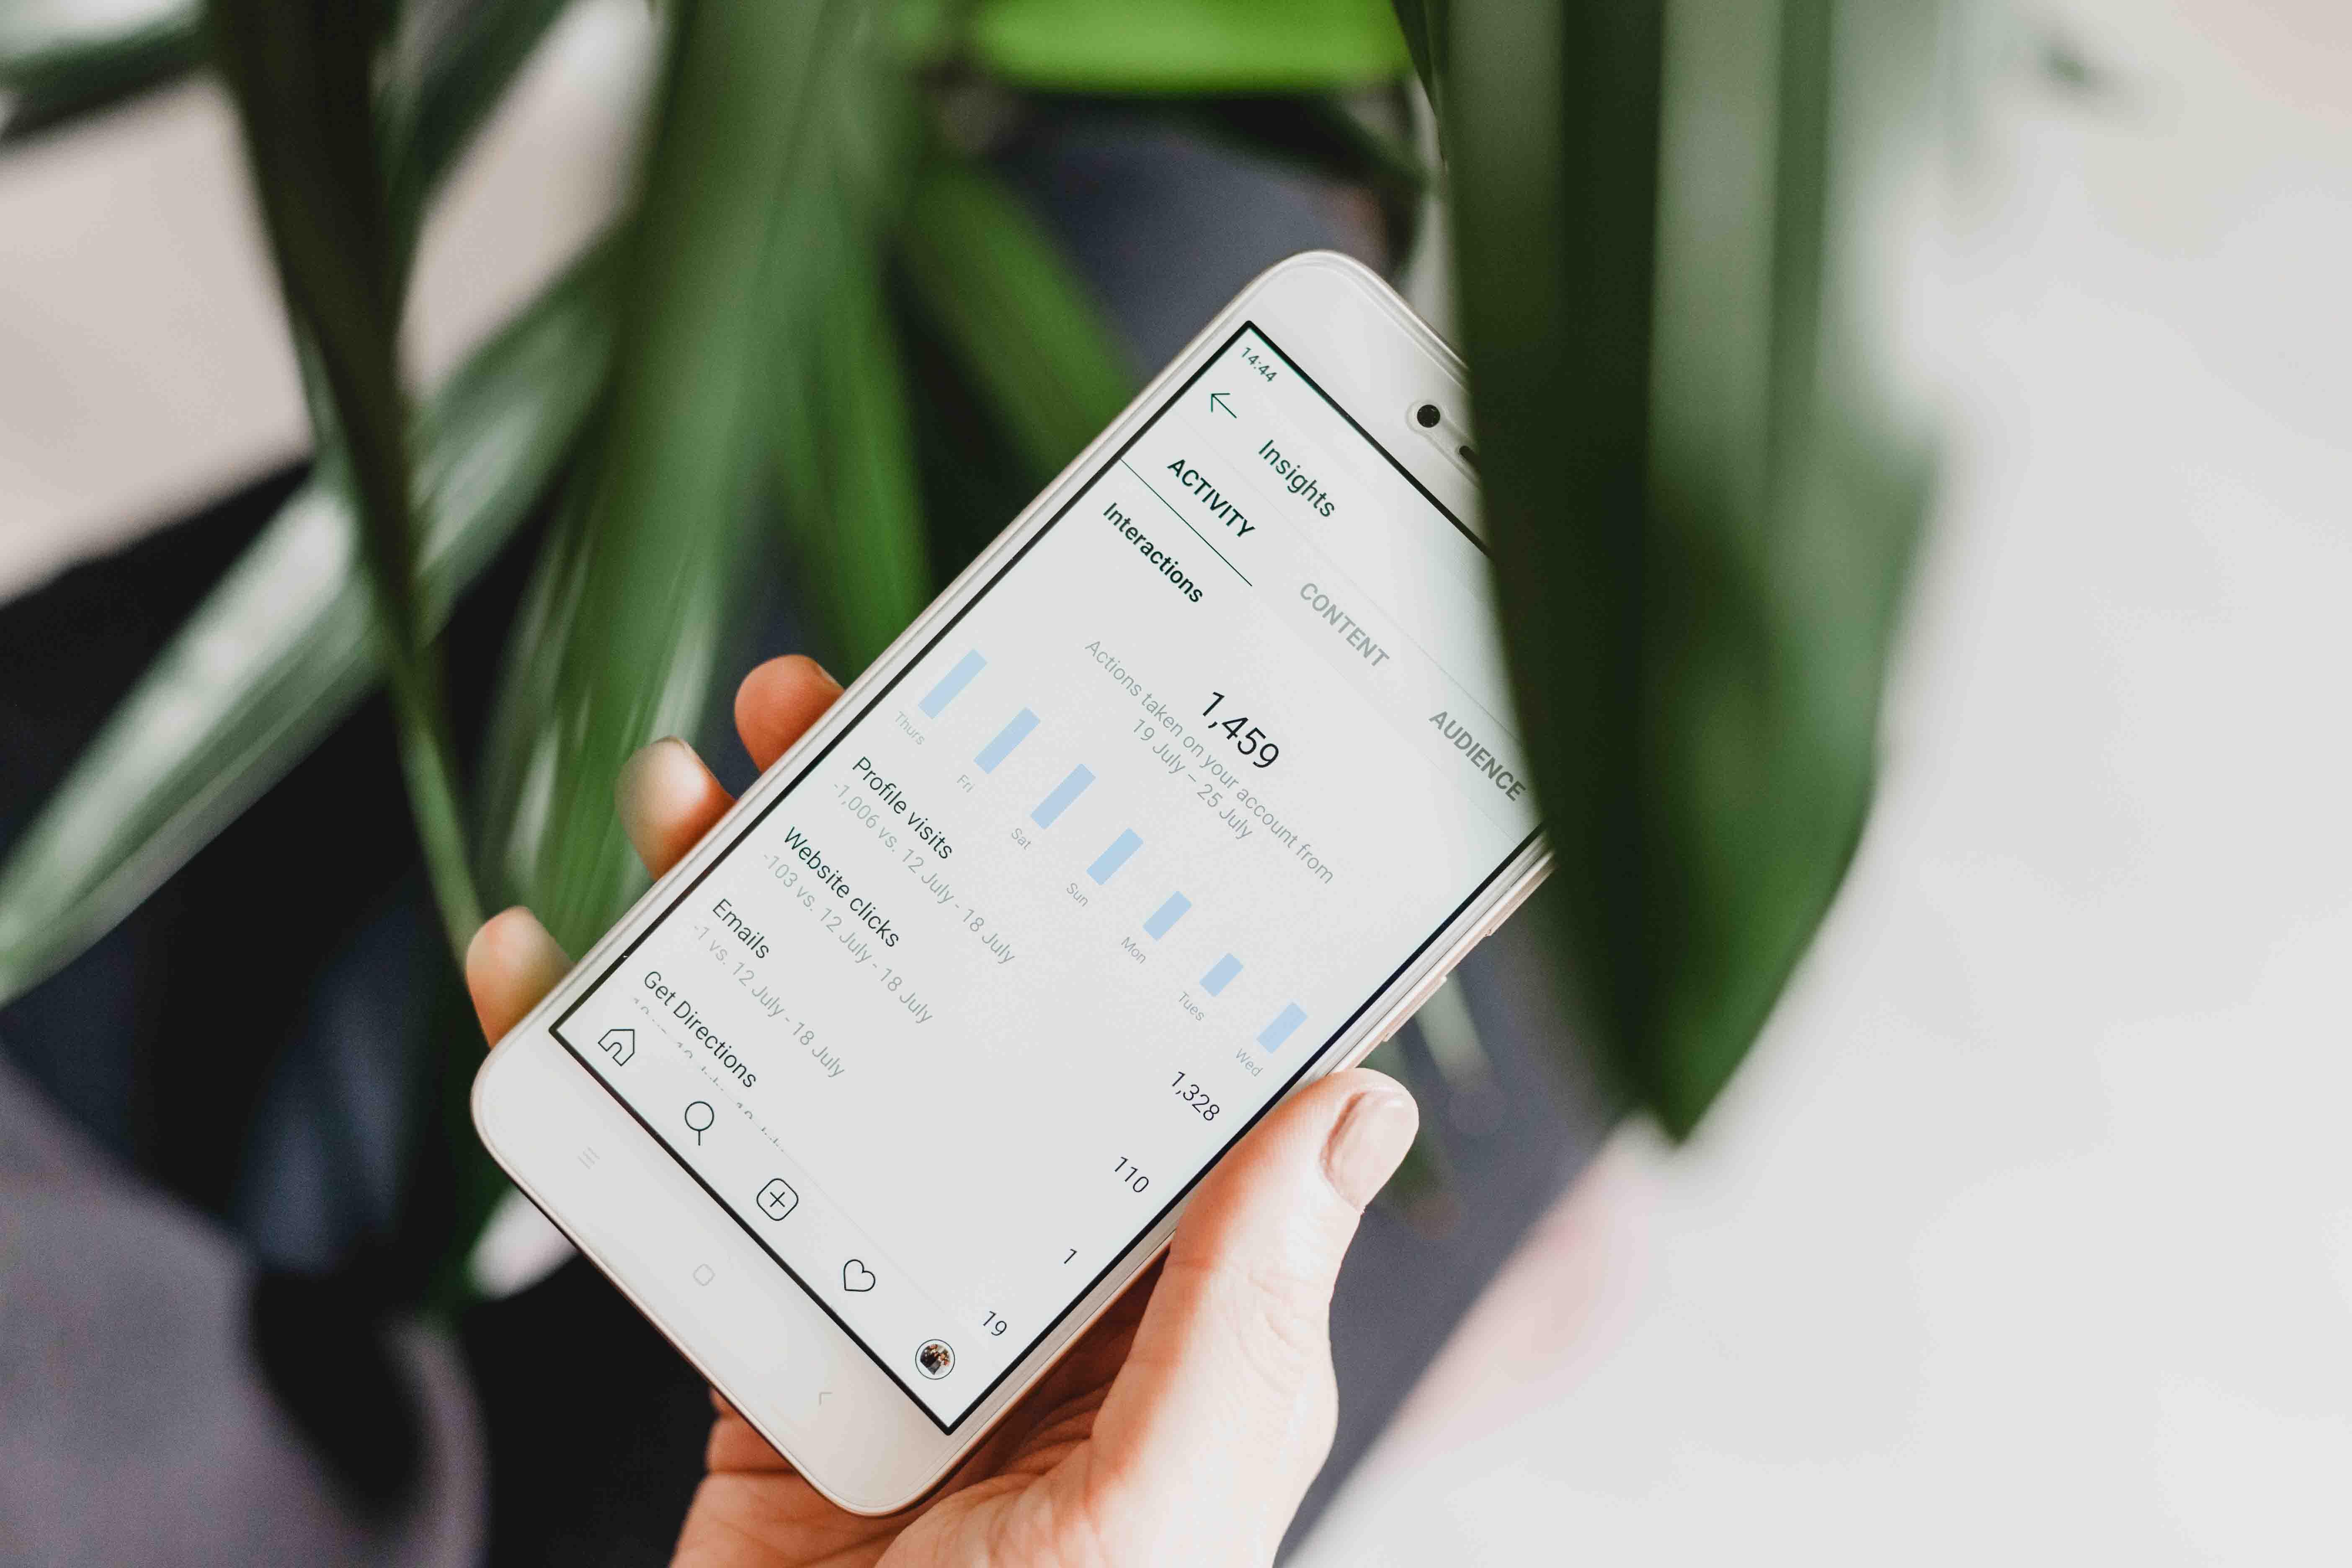 Analytics on a smart phone